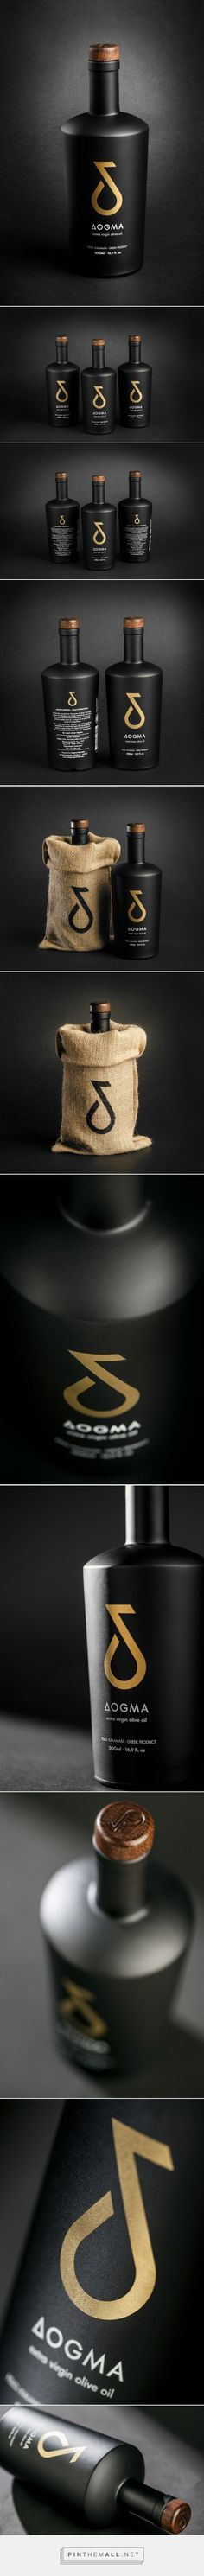 OGMA Extra Virgin Olive Oil by Ioannis Fetanis for Dogma Gourmet(Oil Bottle Design) Olive Oil Packaging, Honey Packaging, Glass Packaging, Cool Packaging, Brand Packaging, Olives, Olive Oil Bottles, Web Design, Label Design